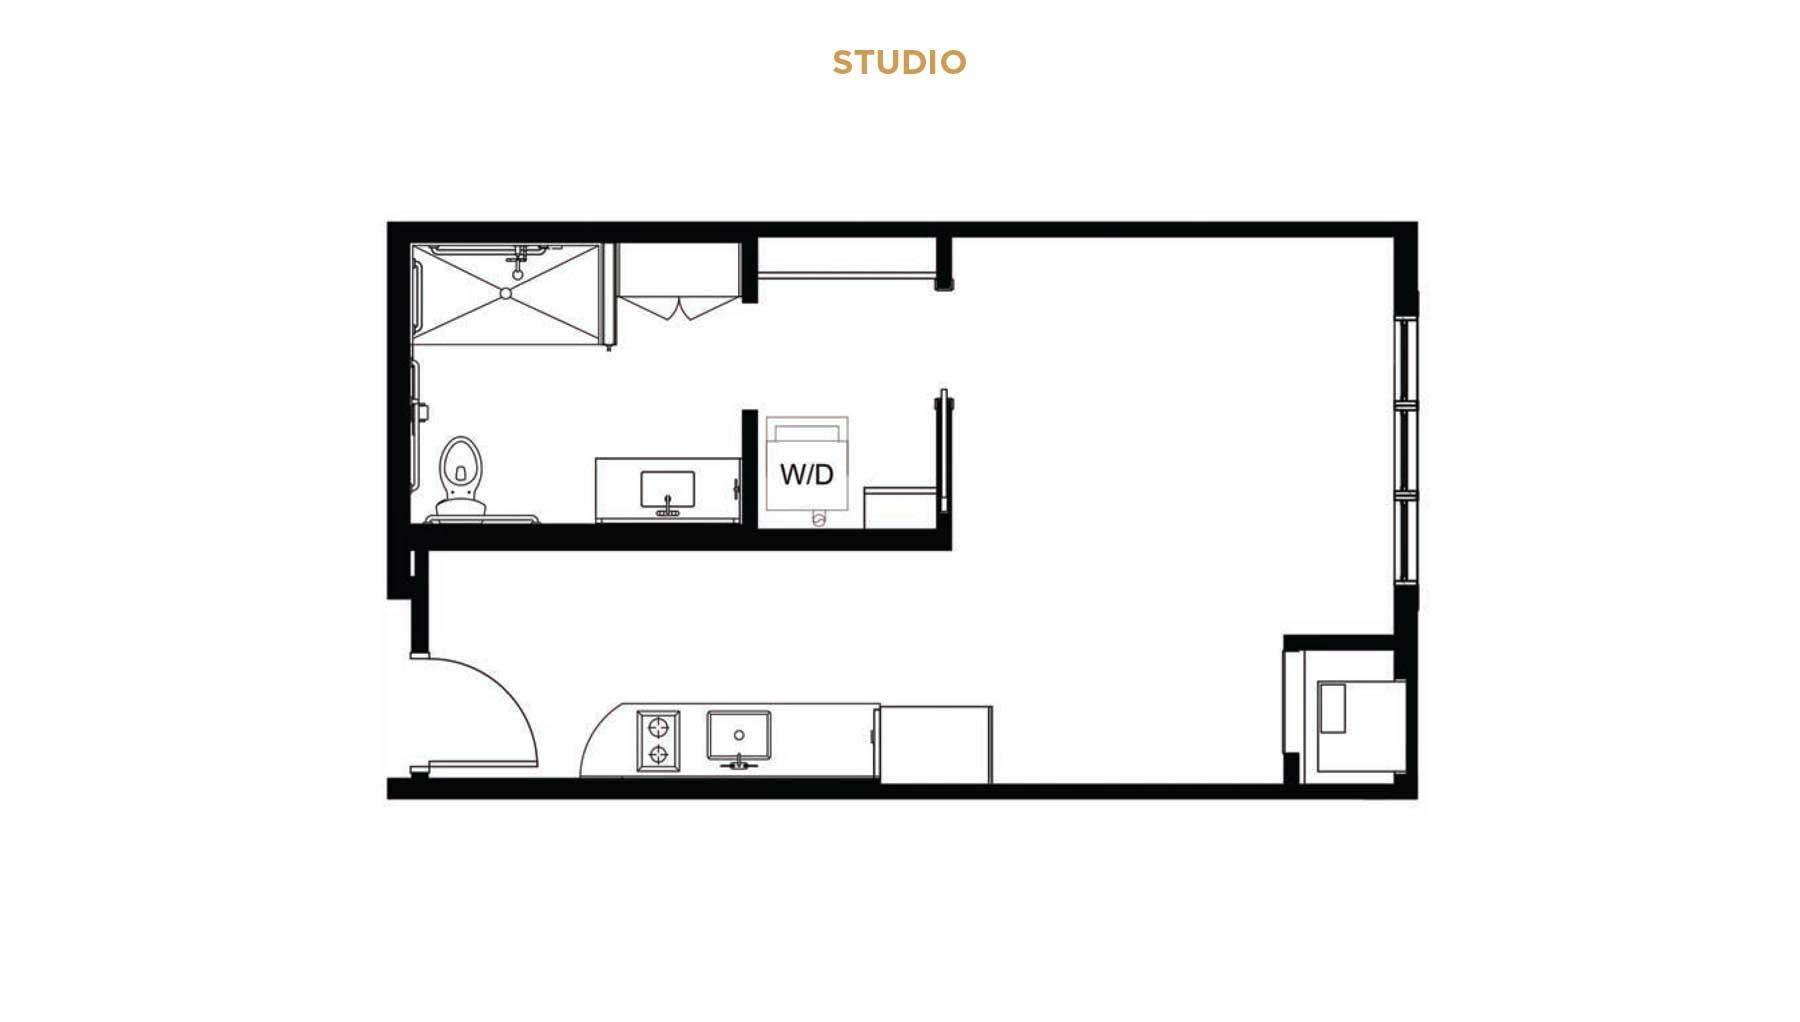 Senior living studio floor plan